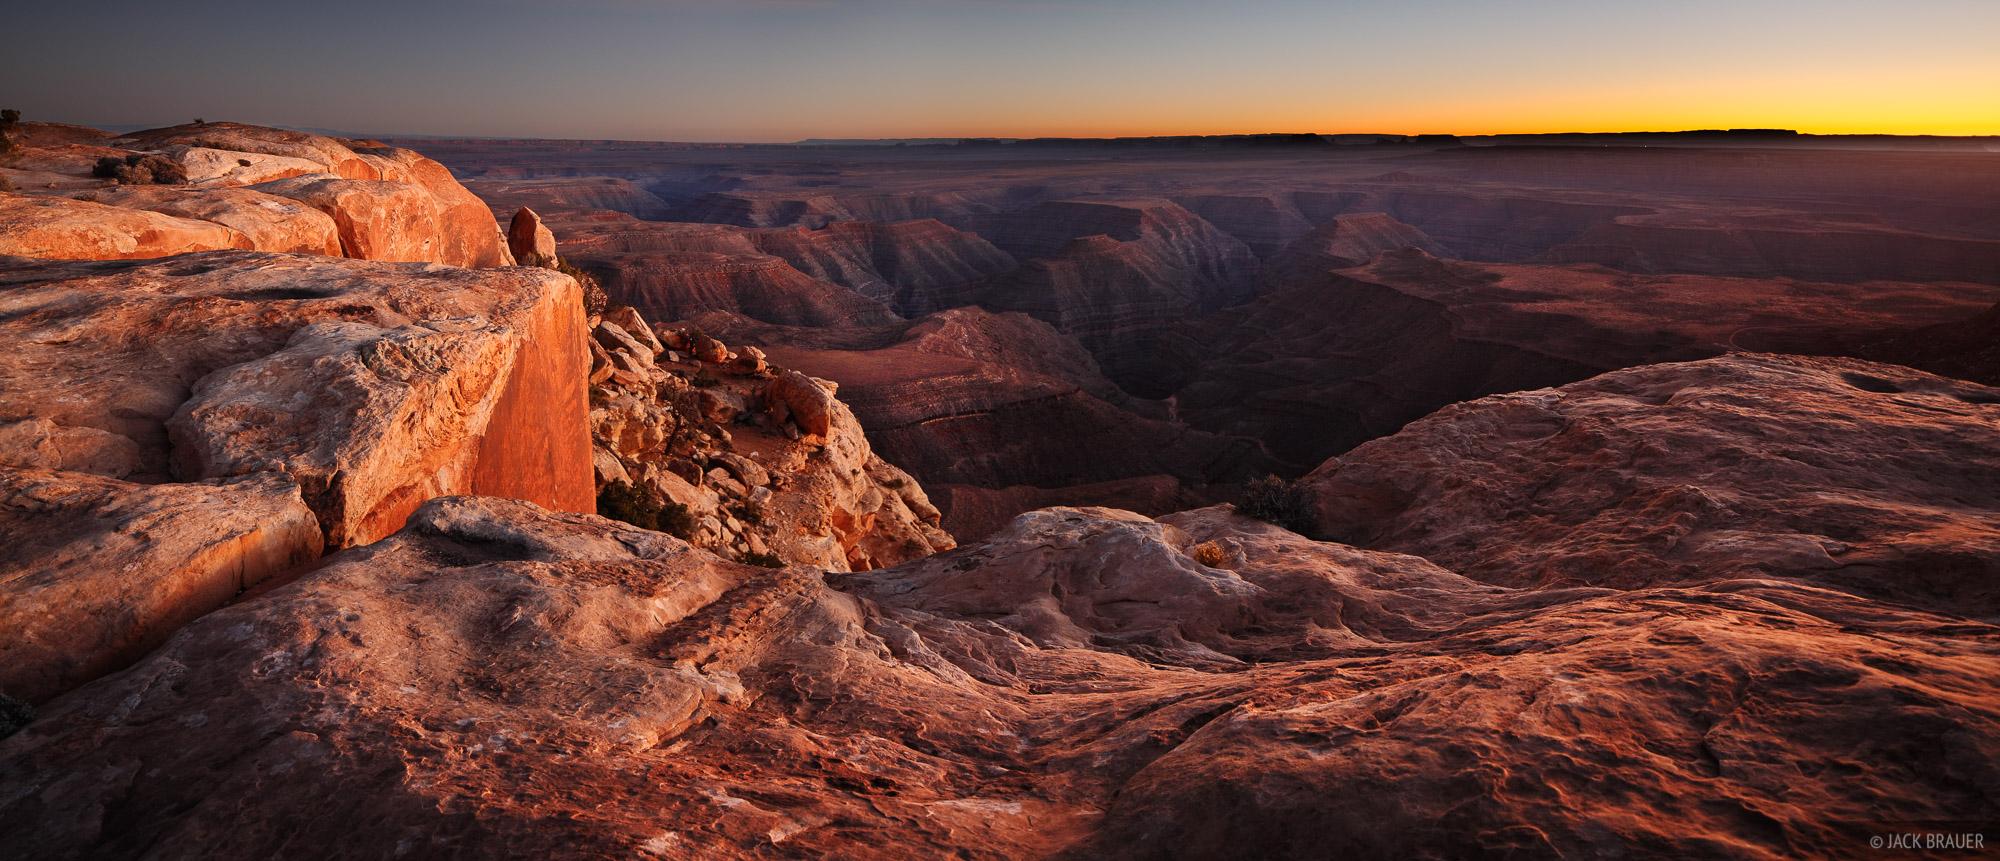 Cedar Mesa, Utah, Goosenecks, San Juan River, sunset, panorama, photo